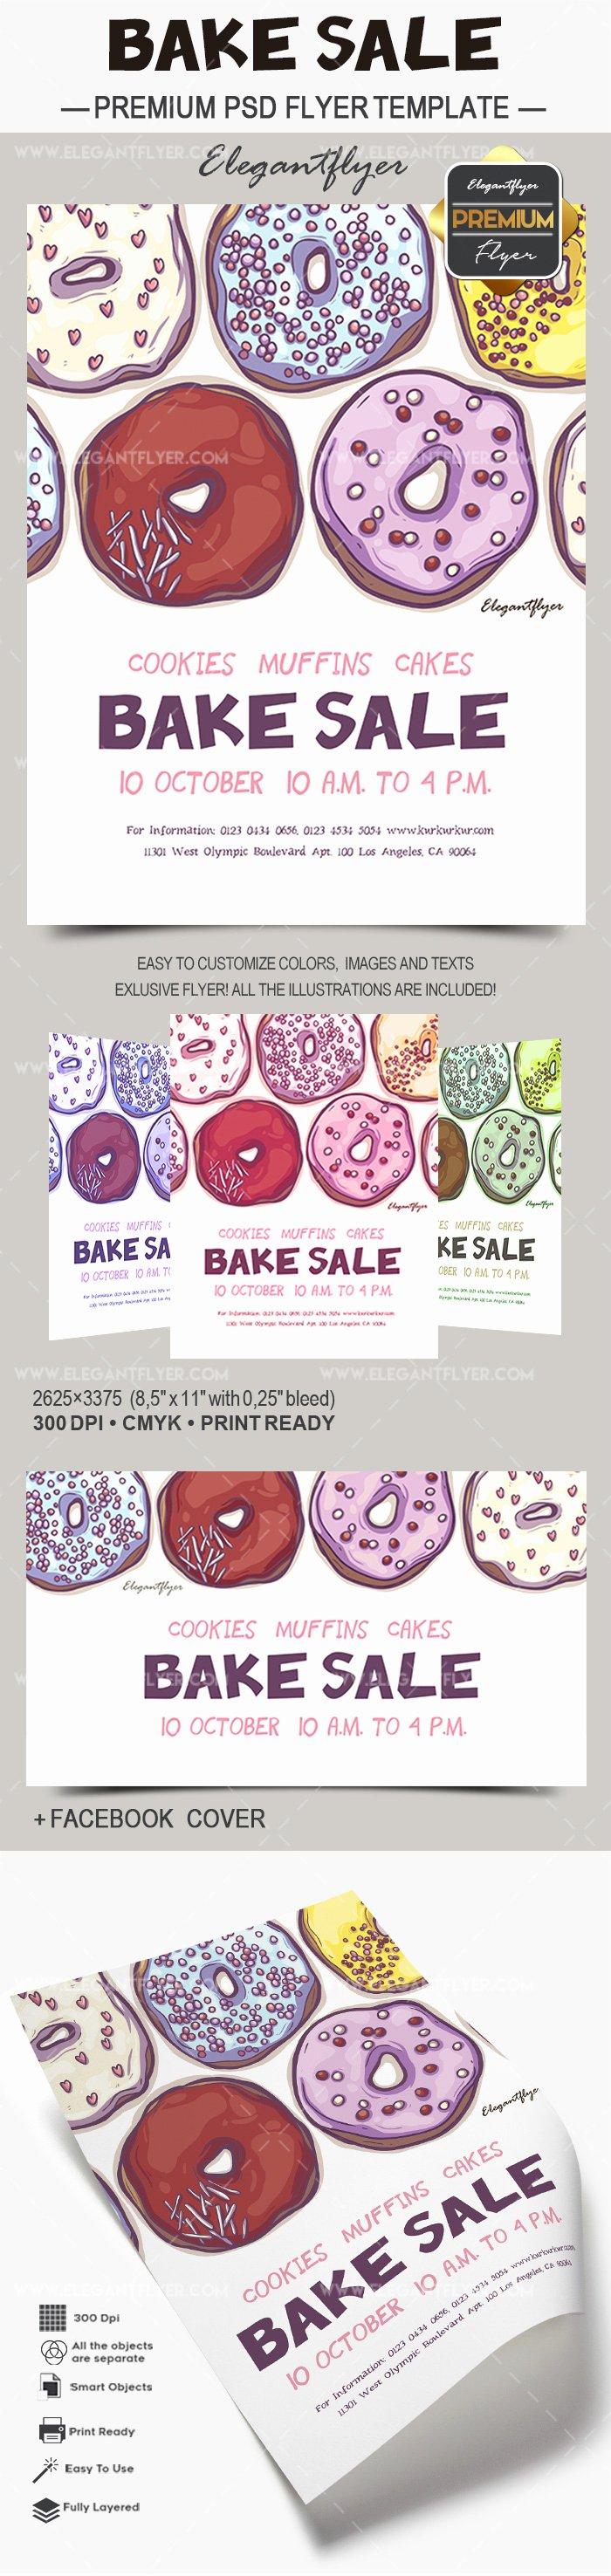 Bake Sale Flyer Template Inspirational Bake Sale Flyer Template – by Elegantflyer